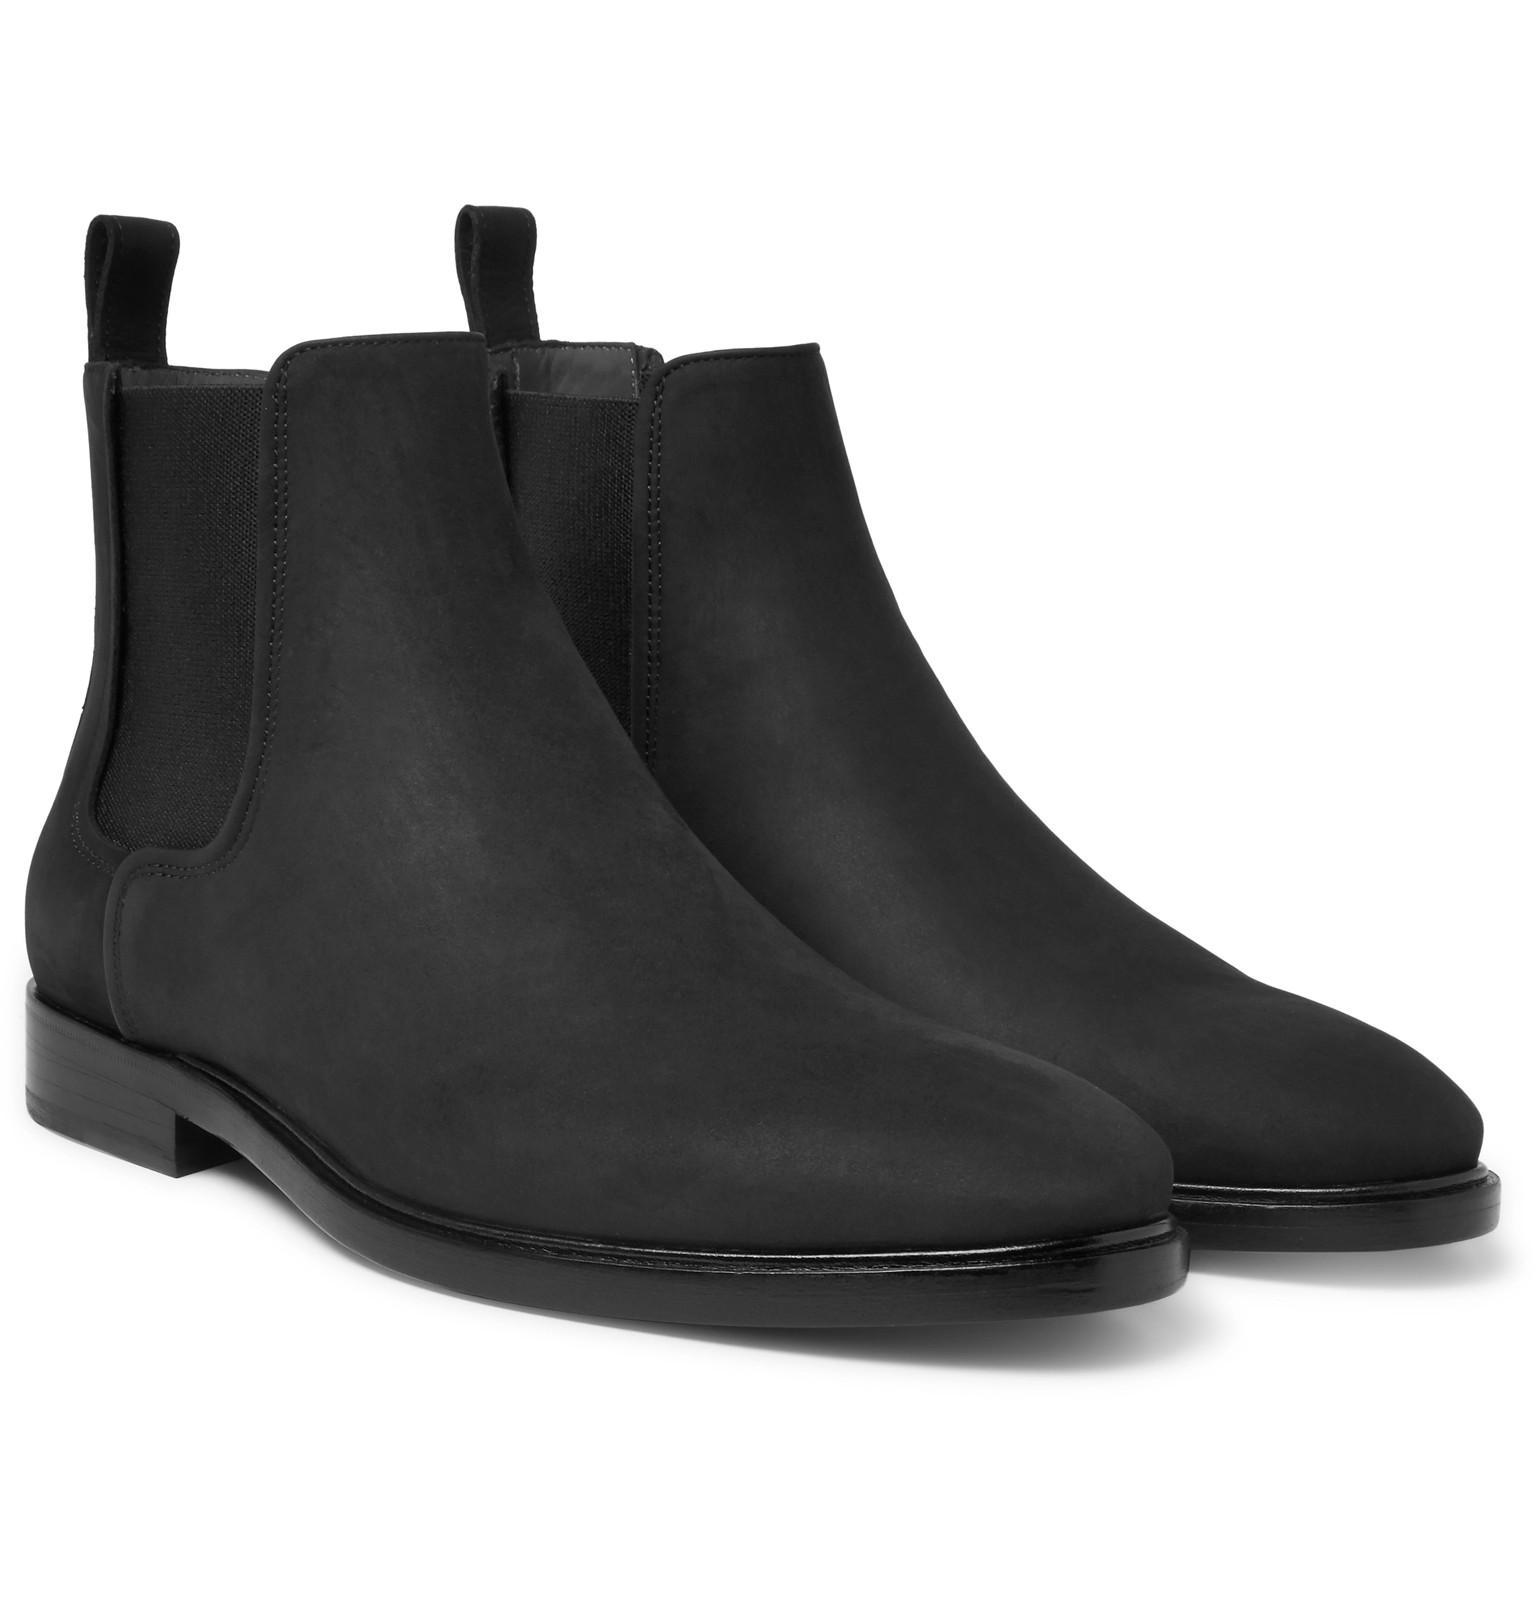 LanvinNubuck Chelsea Boots 110bAlr